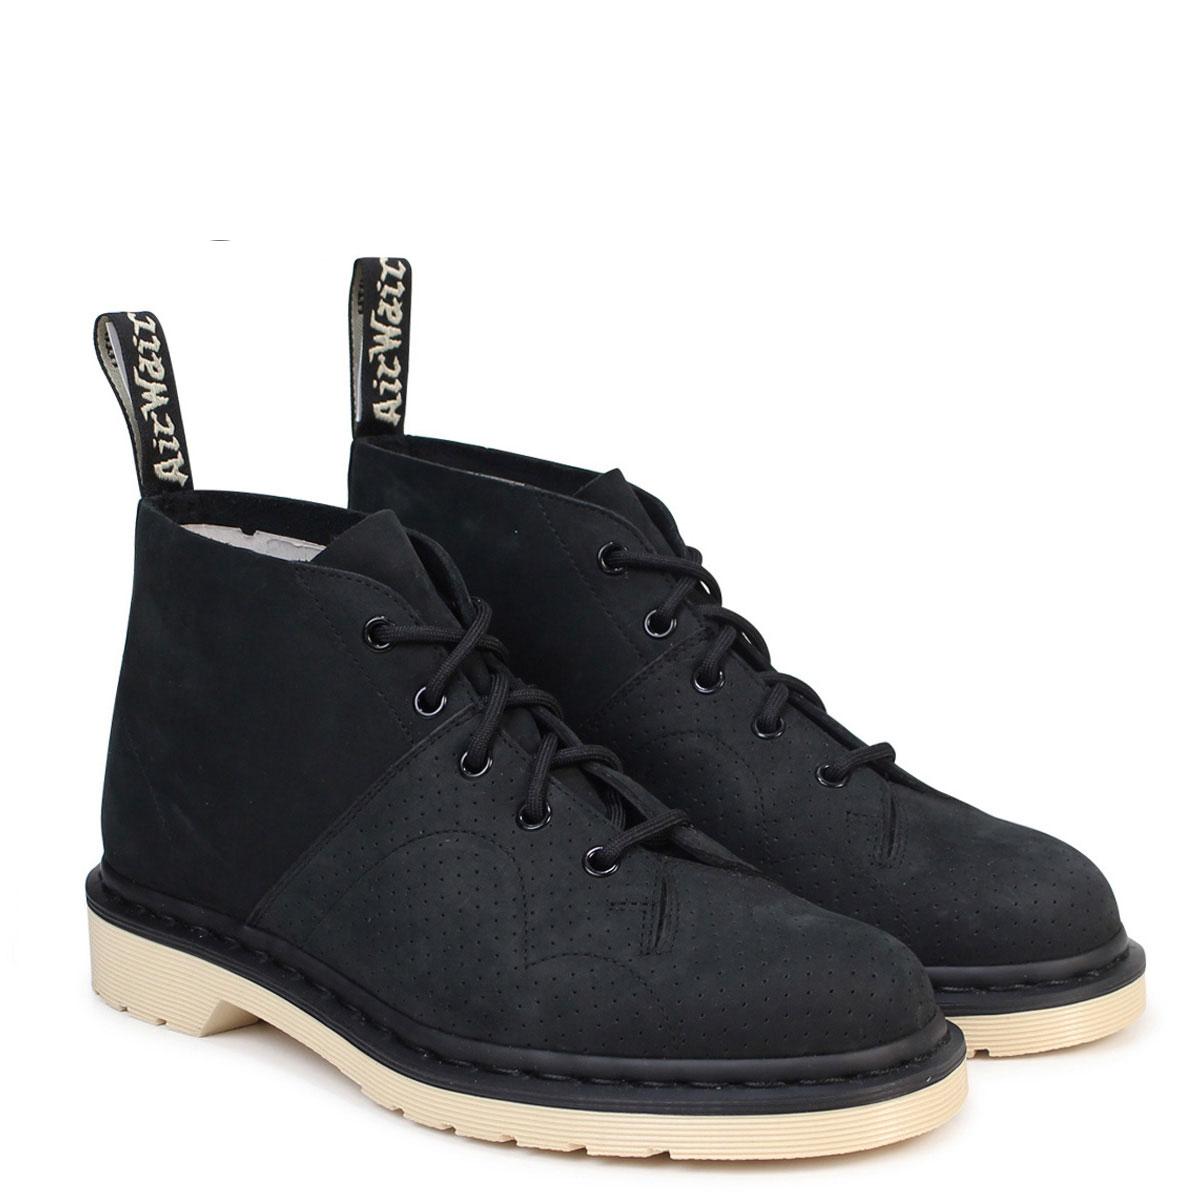 6ad721e469 Dr.Martens chukka boots doctor Martin CHURCH KAYA 22156001 men's black [4/3  ...